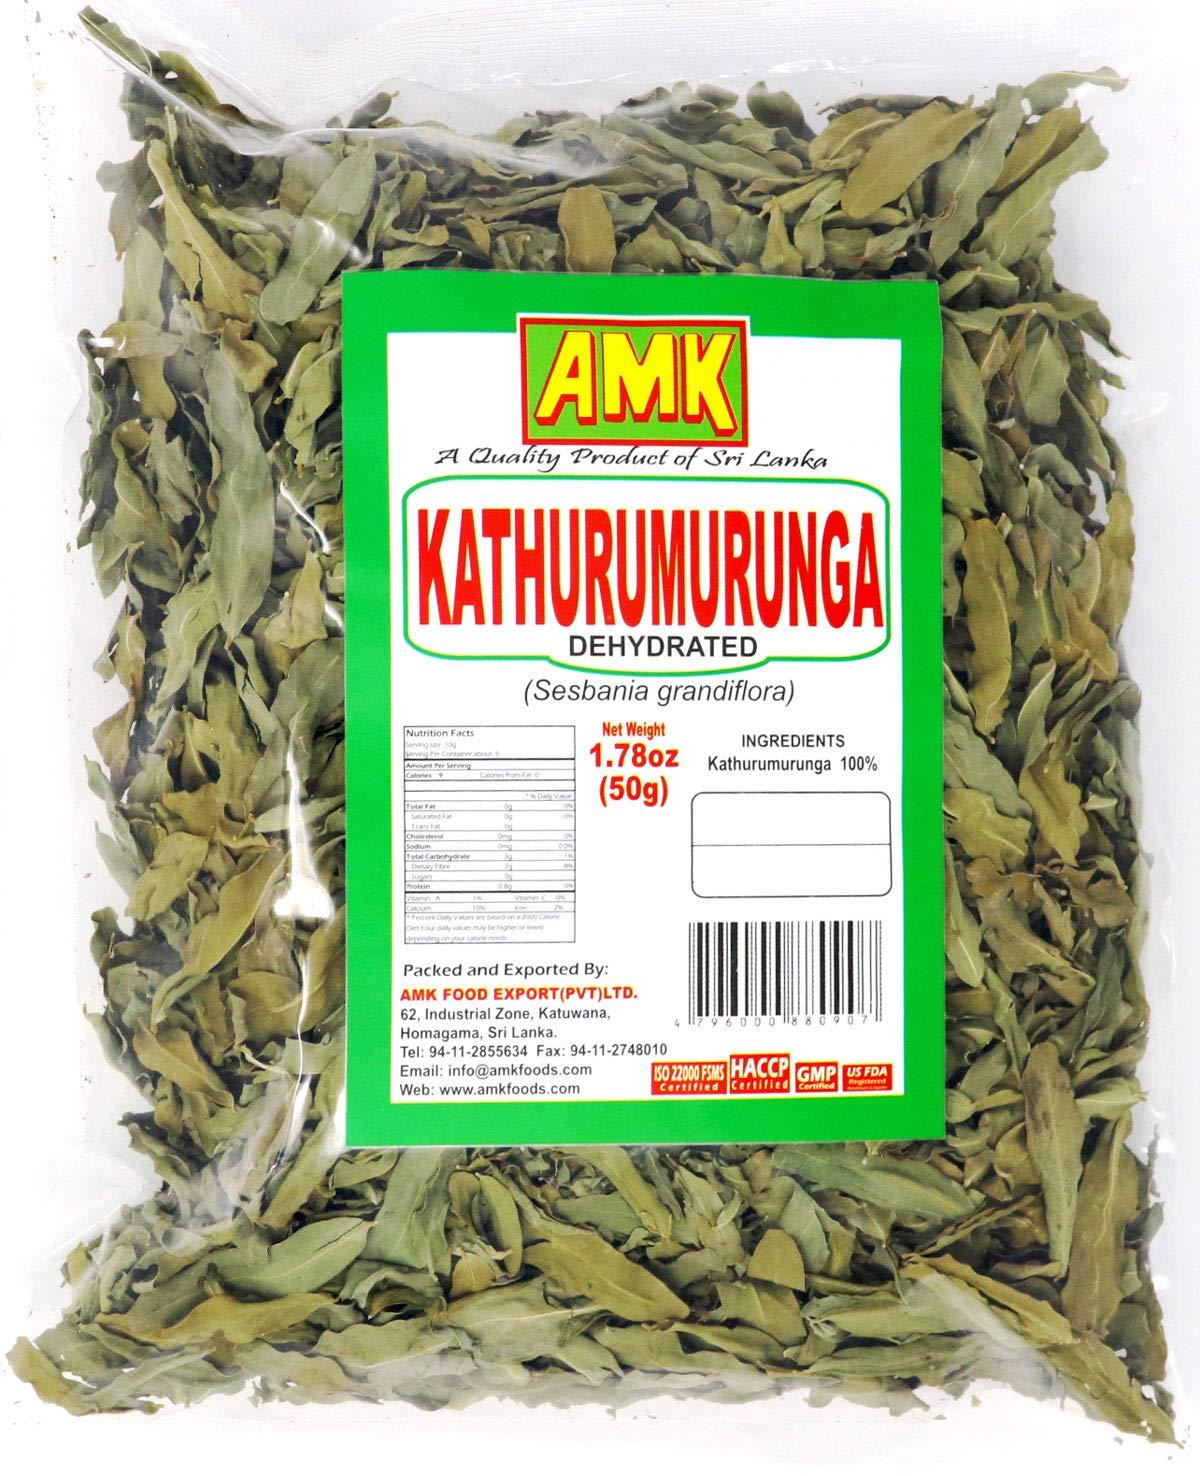 Kathurumurunga Hummingbird Tree Leaves Free Shipping Cheap Bargain Gift Dehydrated Pack - 2 Miami Mall 50g